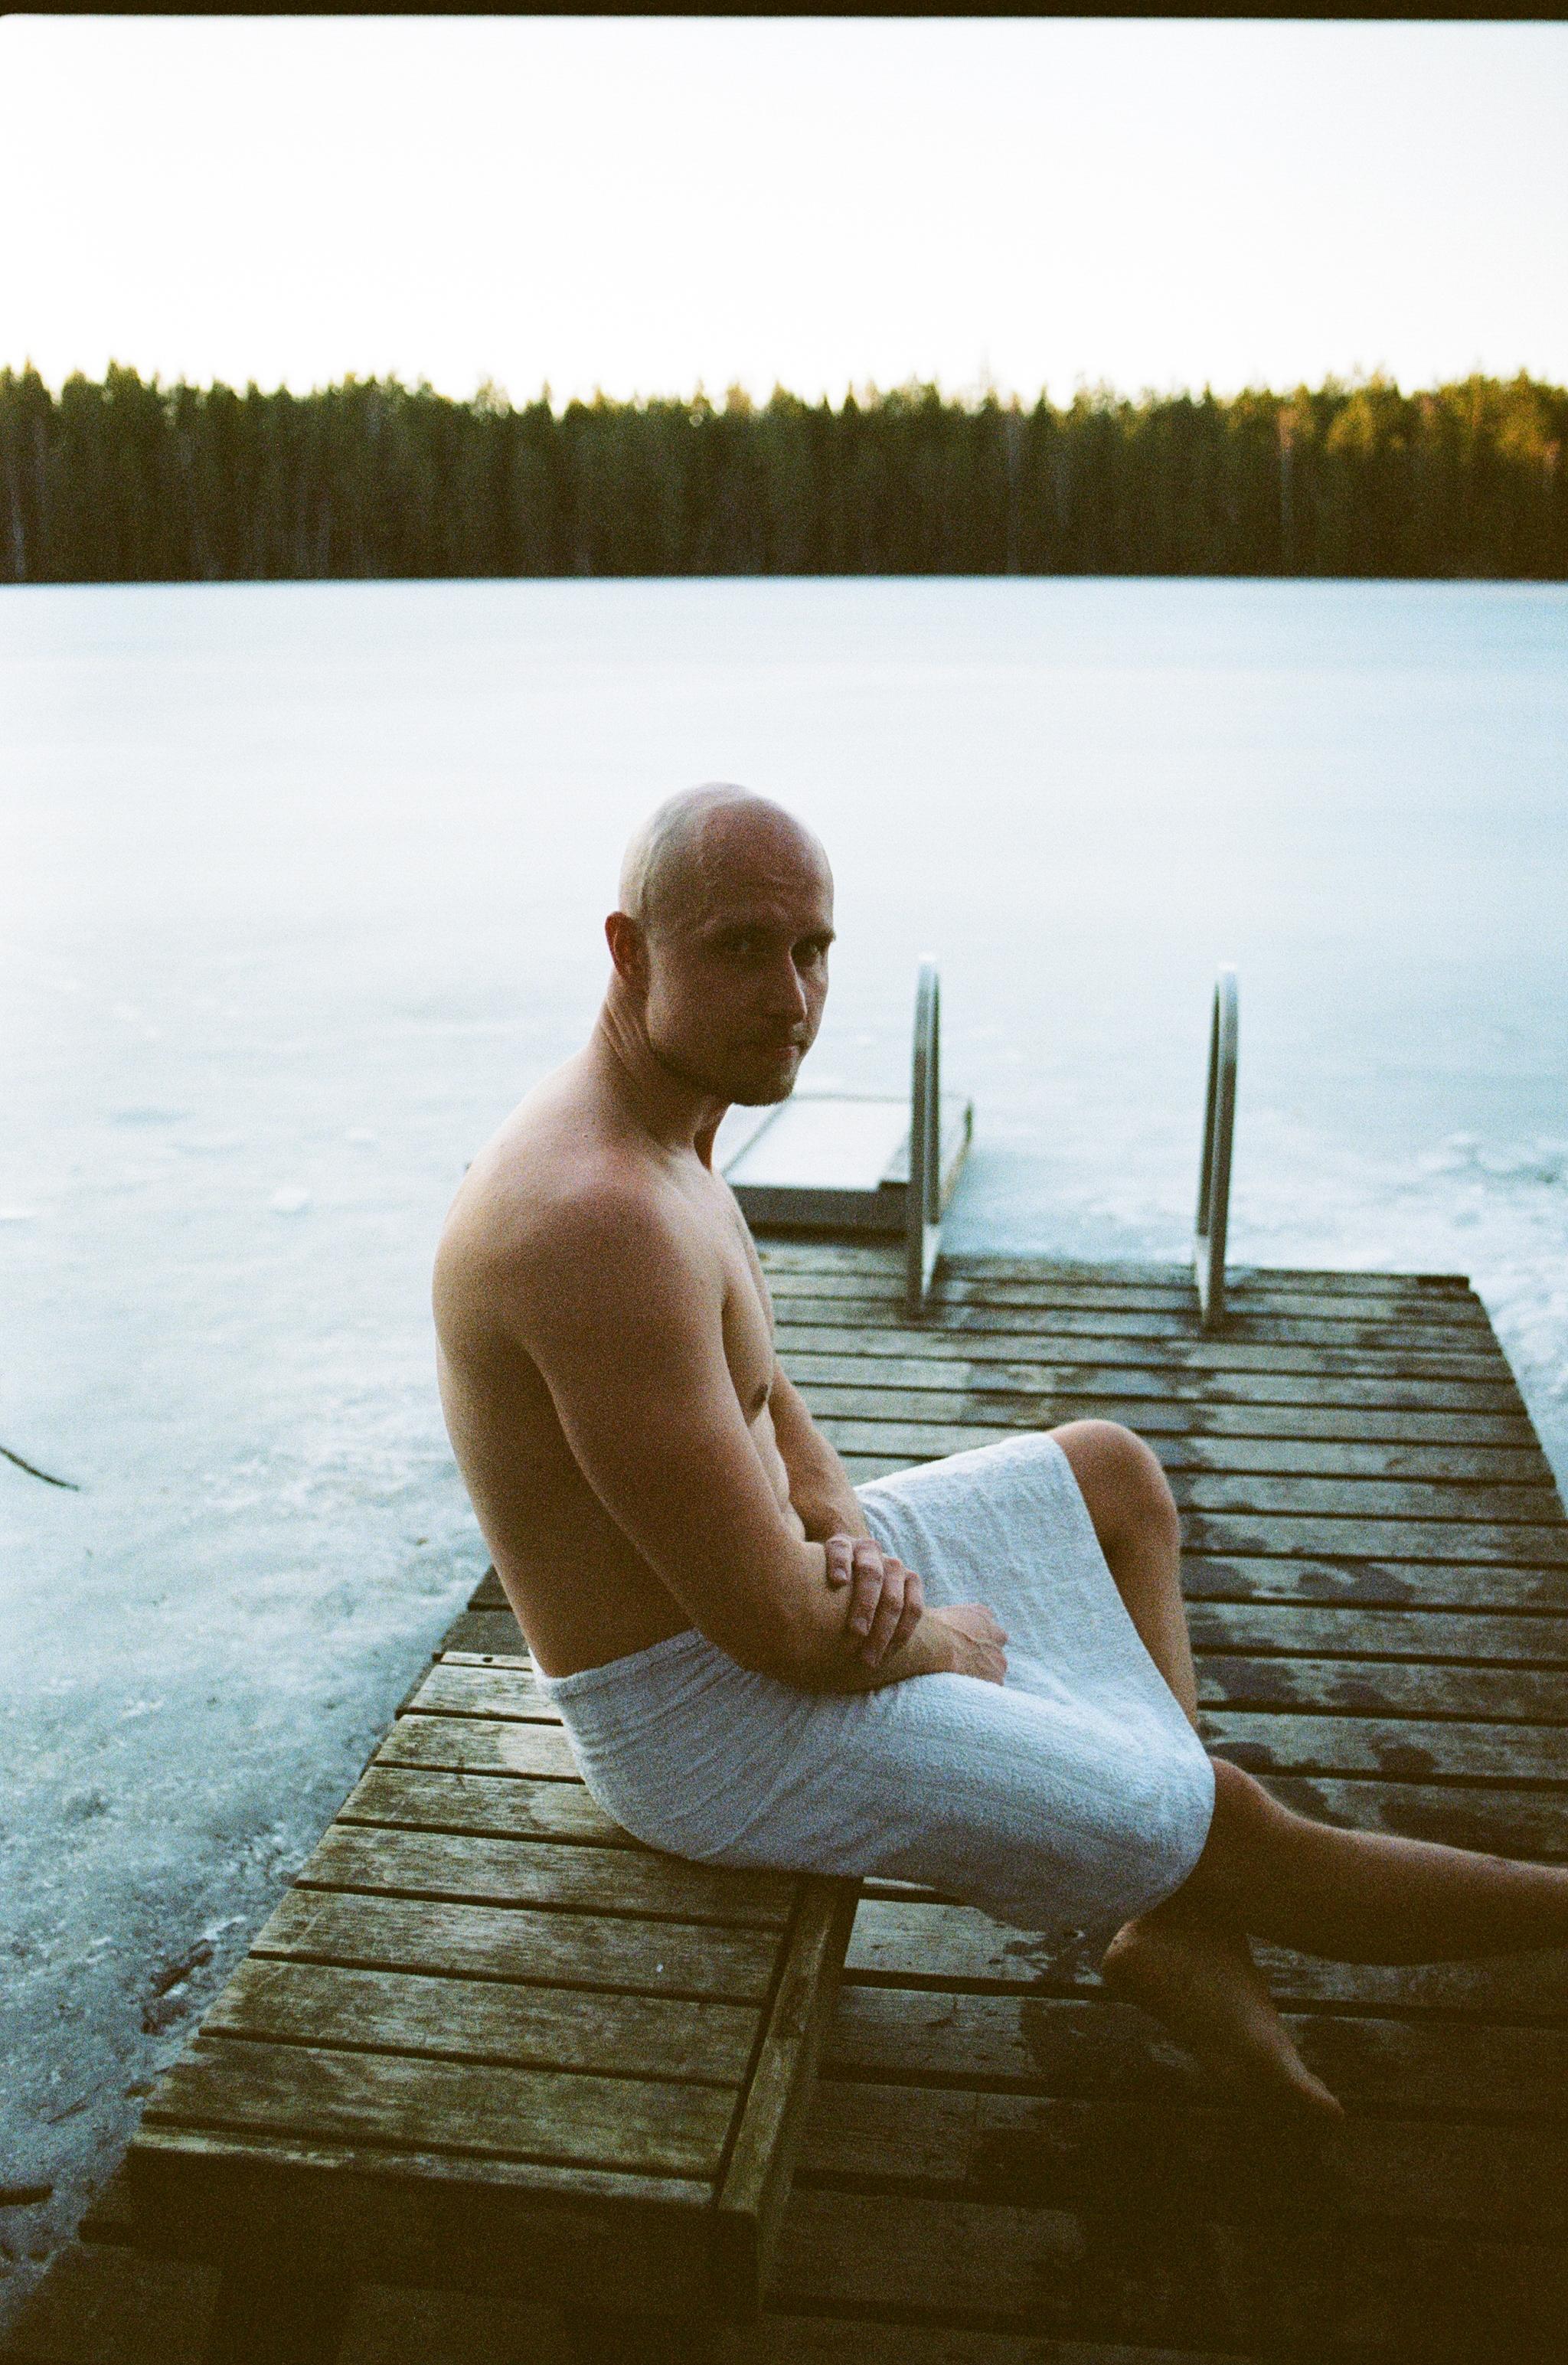 henrik-koskelo-sauna-7.jpg